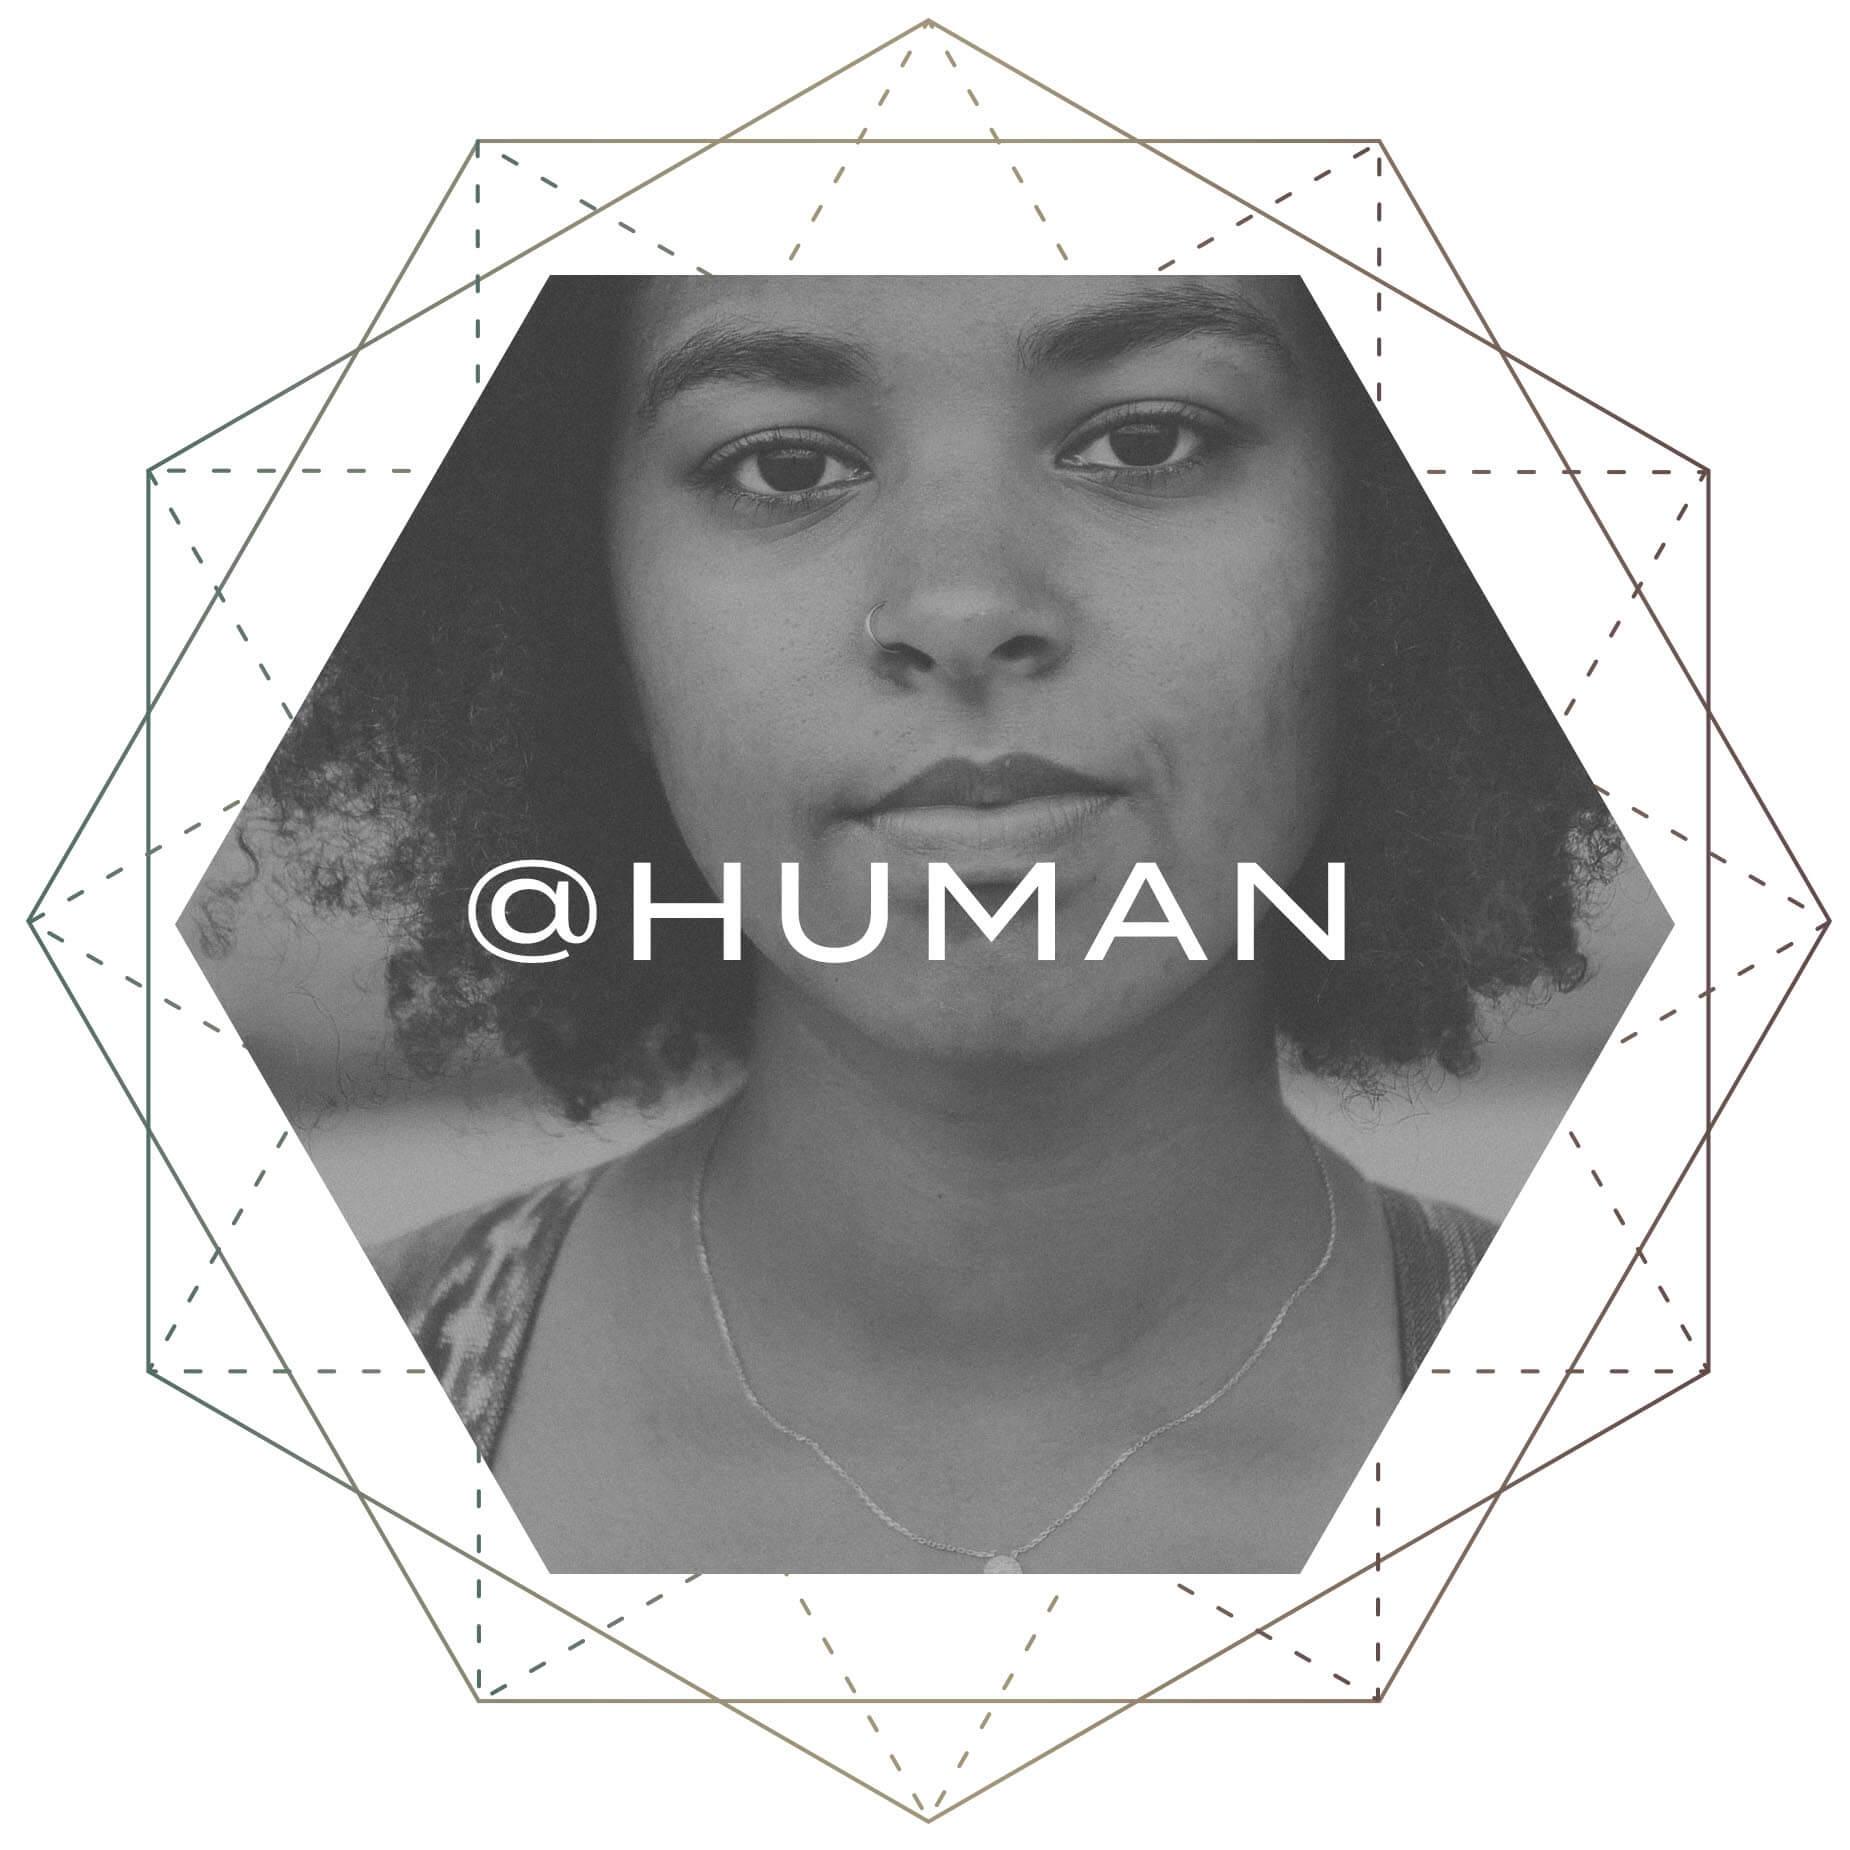 Humans-1-1